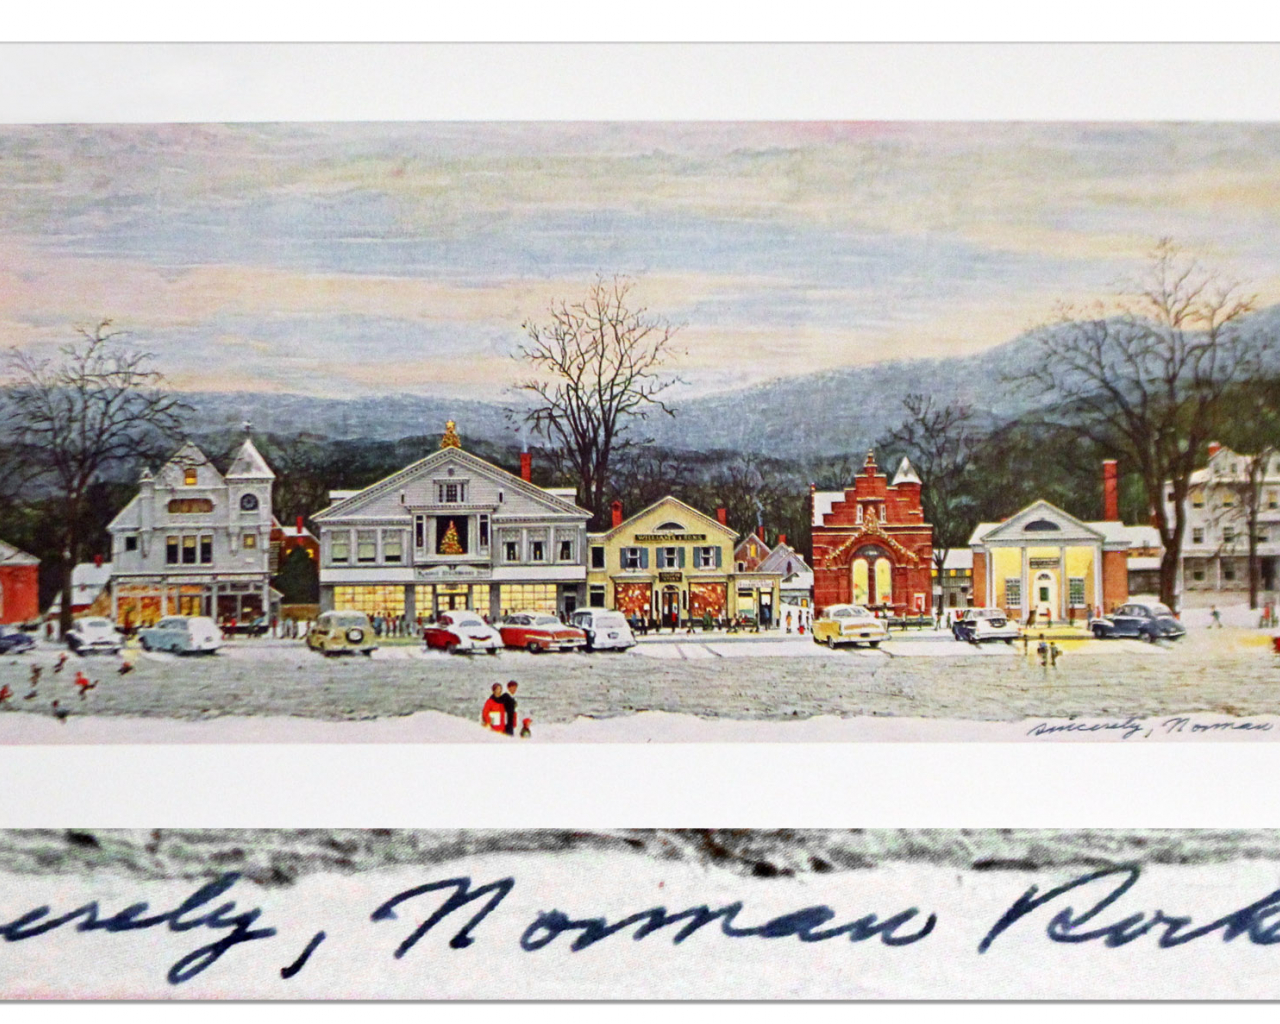 2520x1187px Norman Rockwell Christmas Wallpaper Free - WallpaperSafari